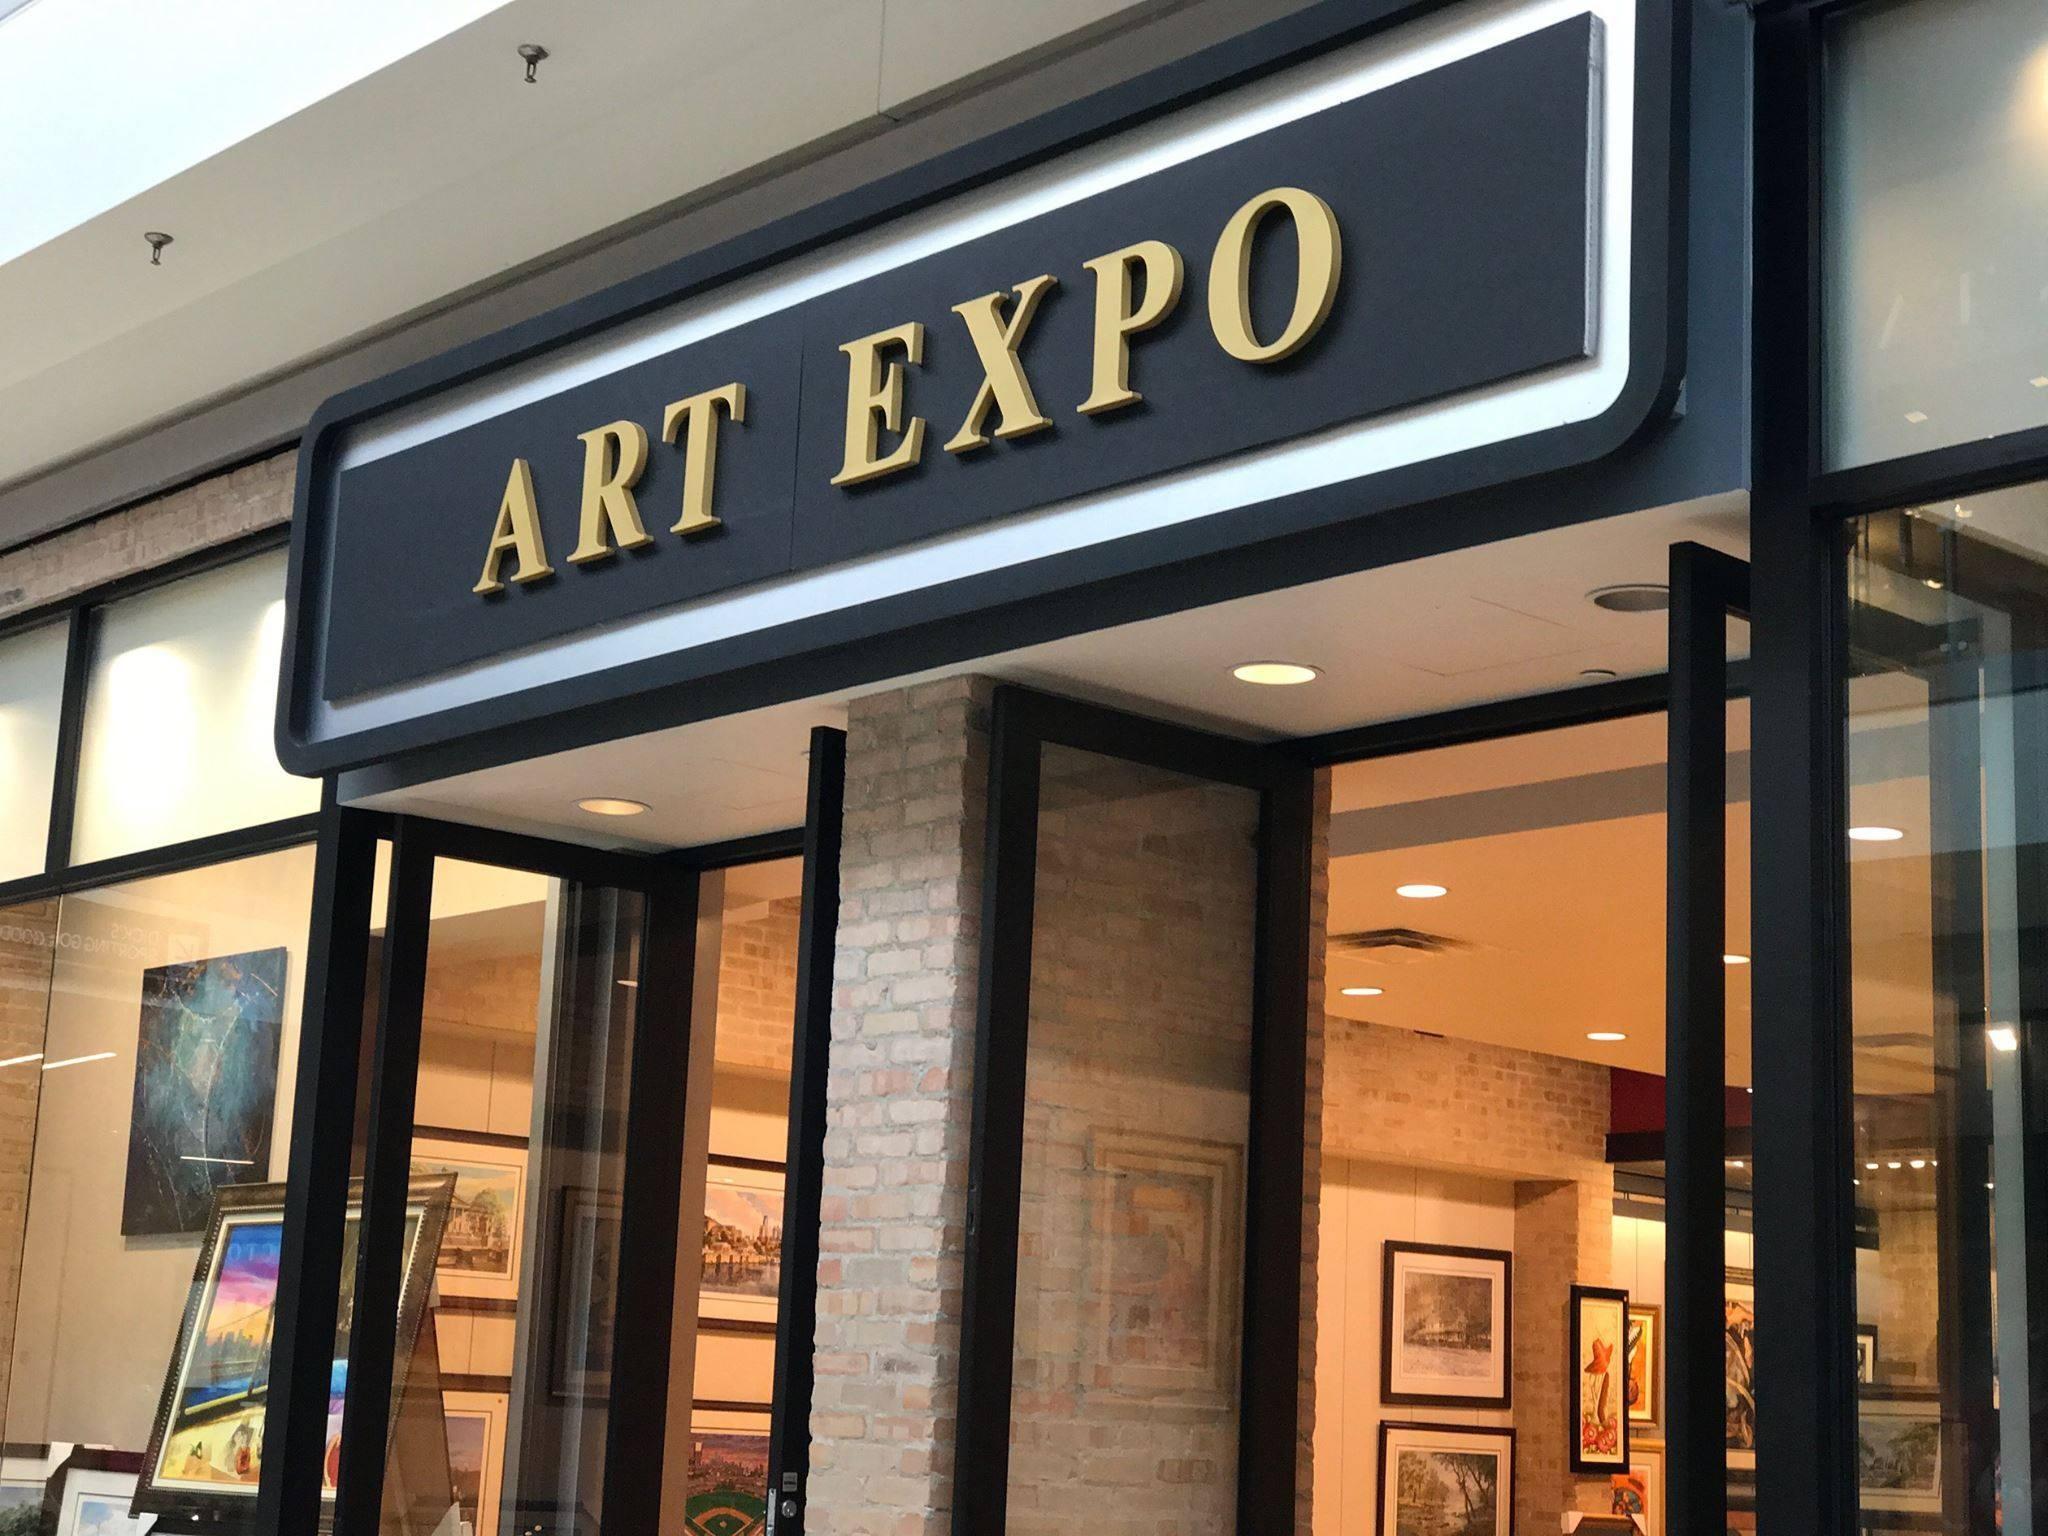 Art Store Signage